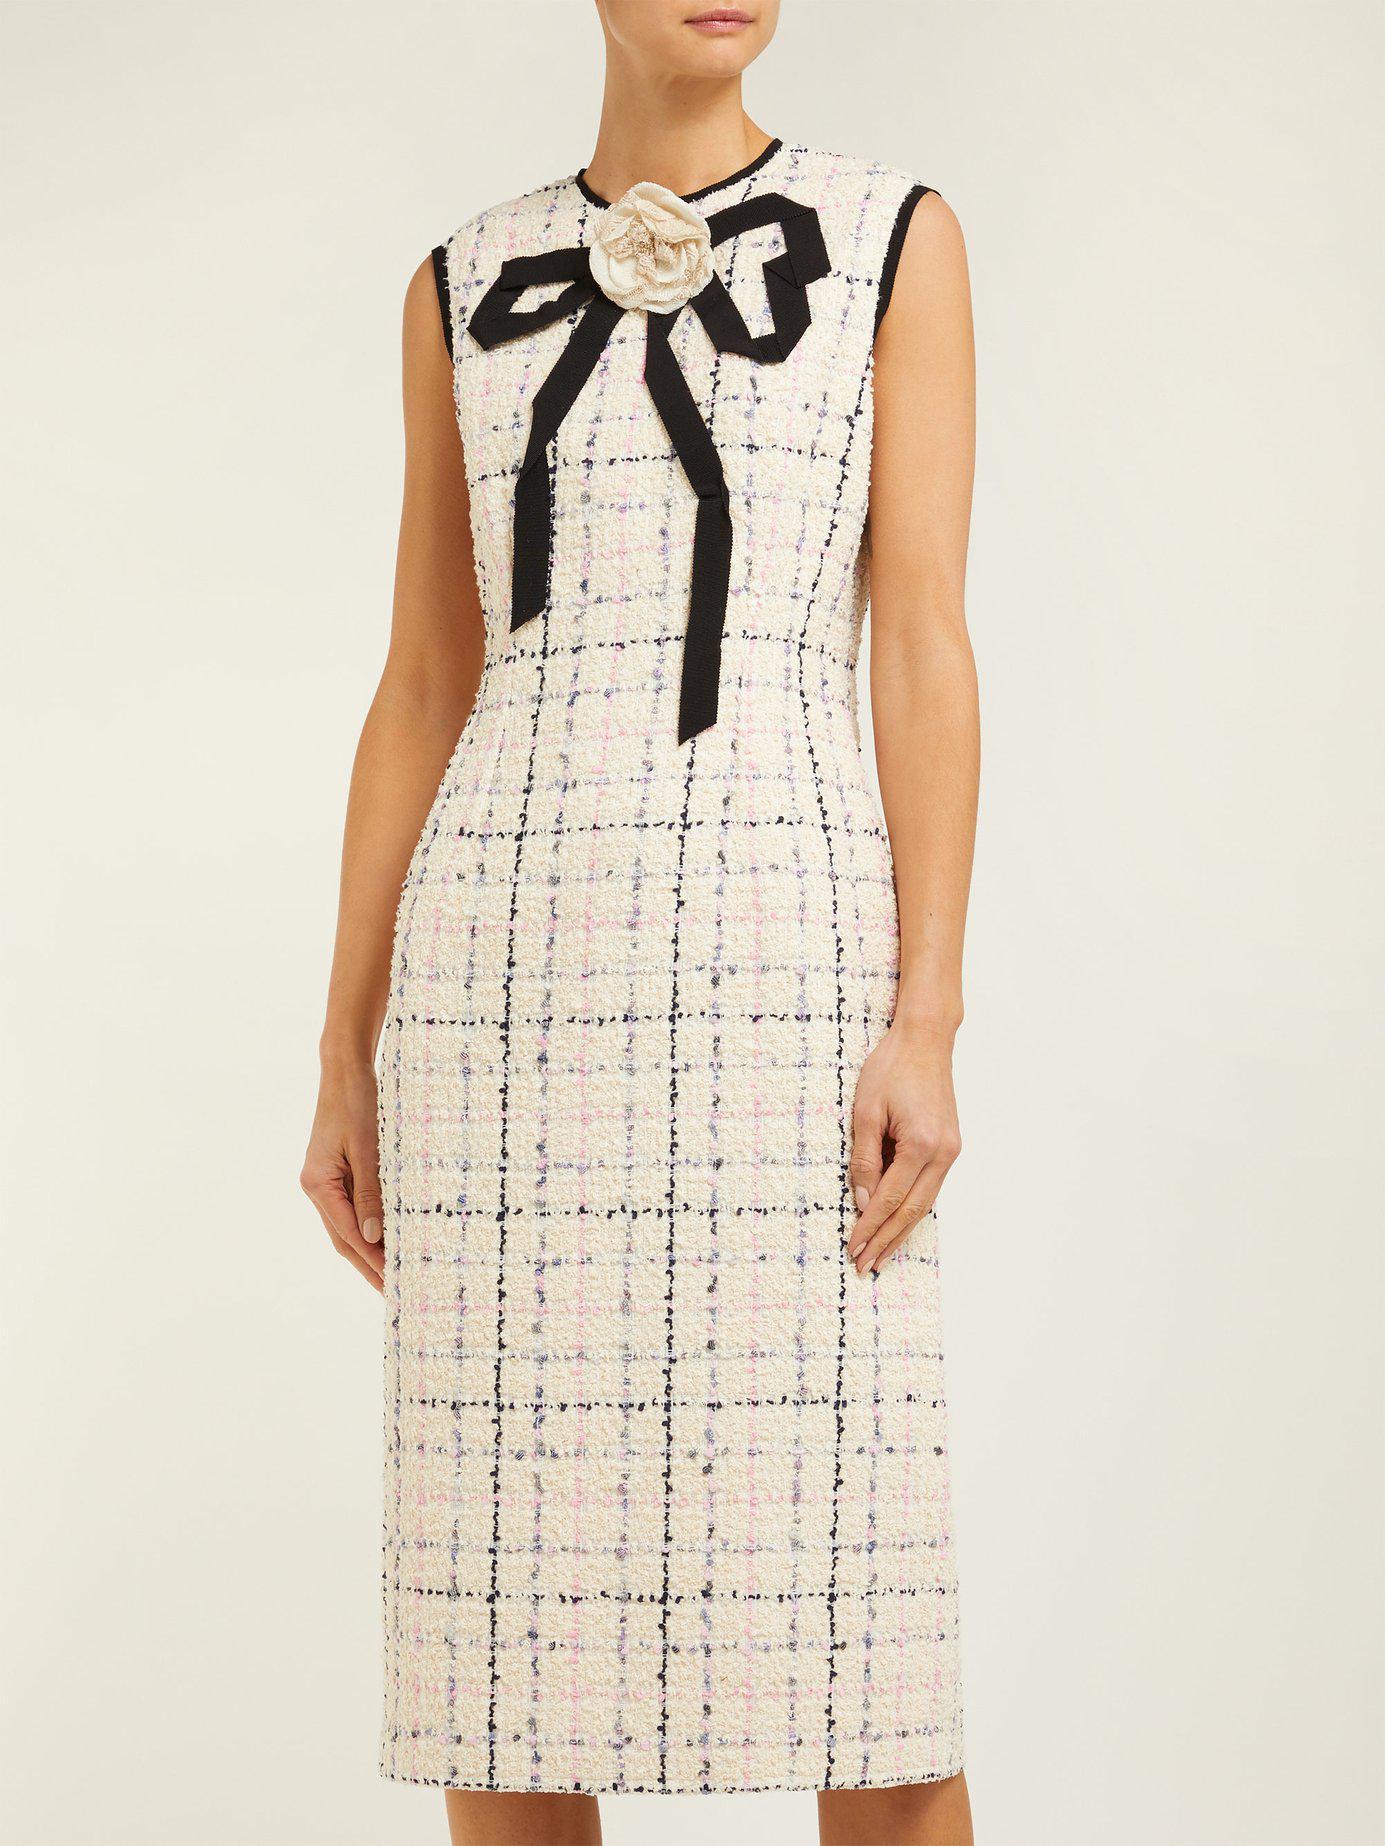 2d570018af Gucci Tweed Dress - Lyst